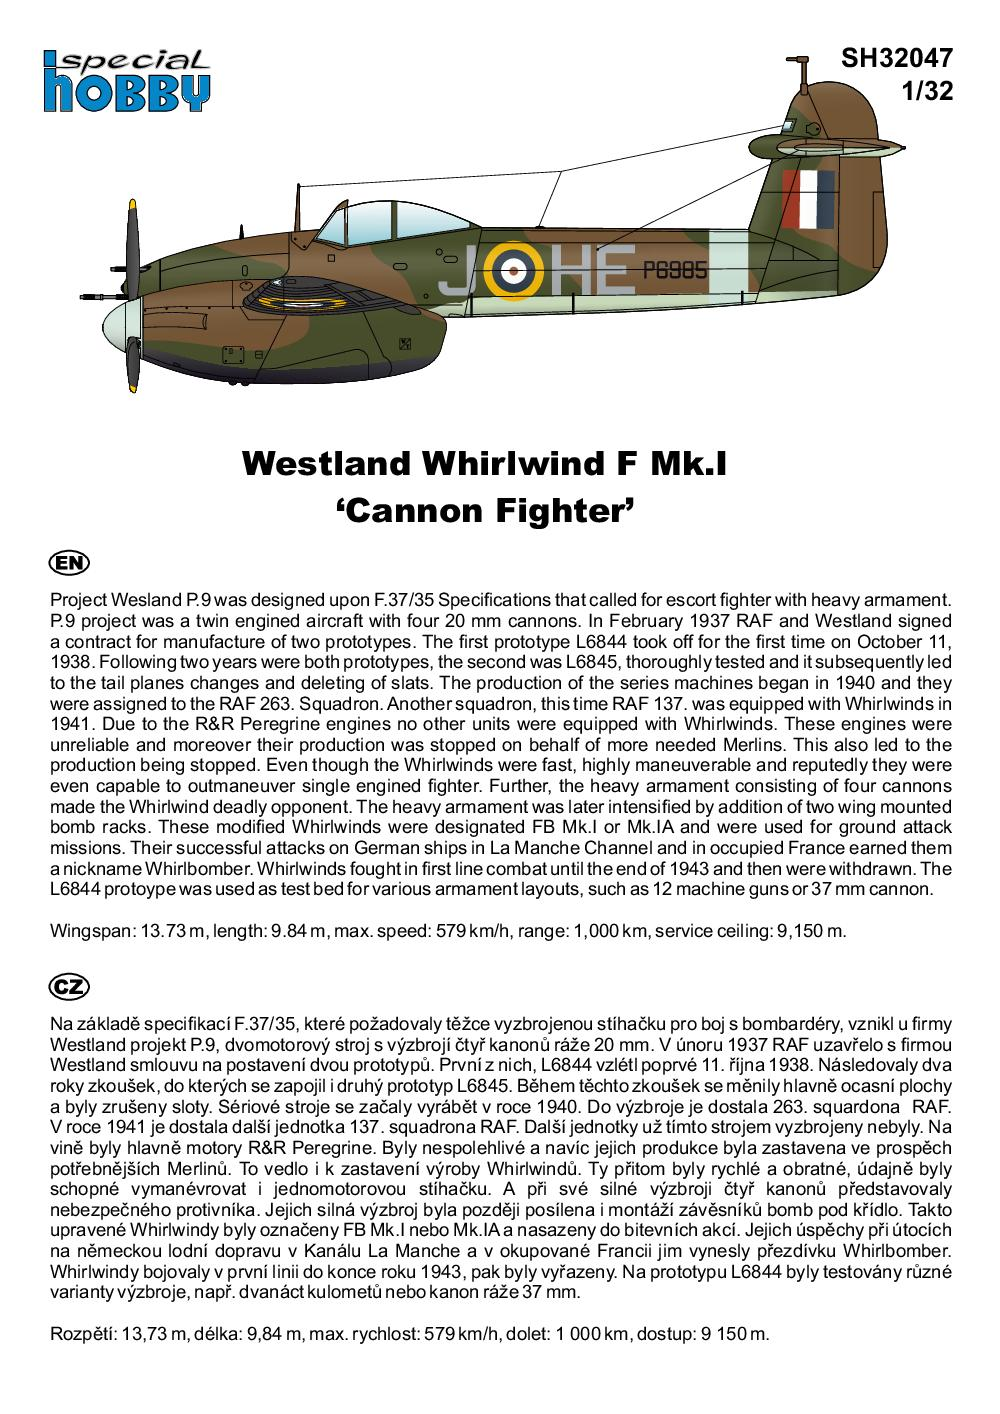 Special-Hobby-SH-32047-Westland-Whirlwind-F.Mk_.I-Bauanleitung-1 Westland Whirlwind F.Mk.I in 1:32 von Special Hobby #32047